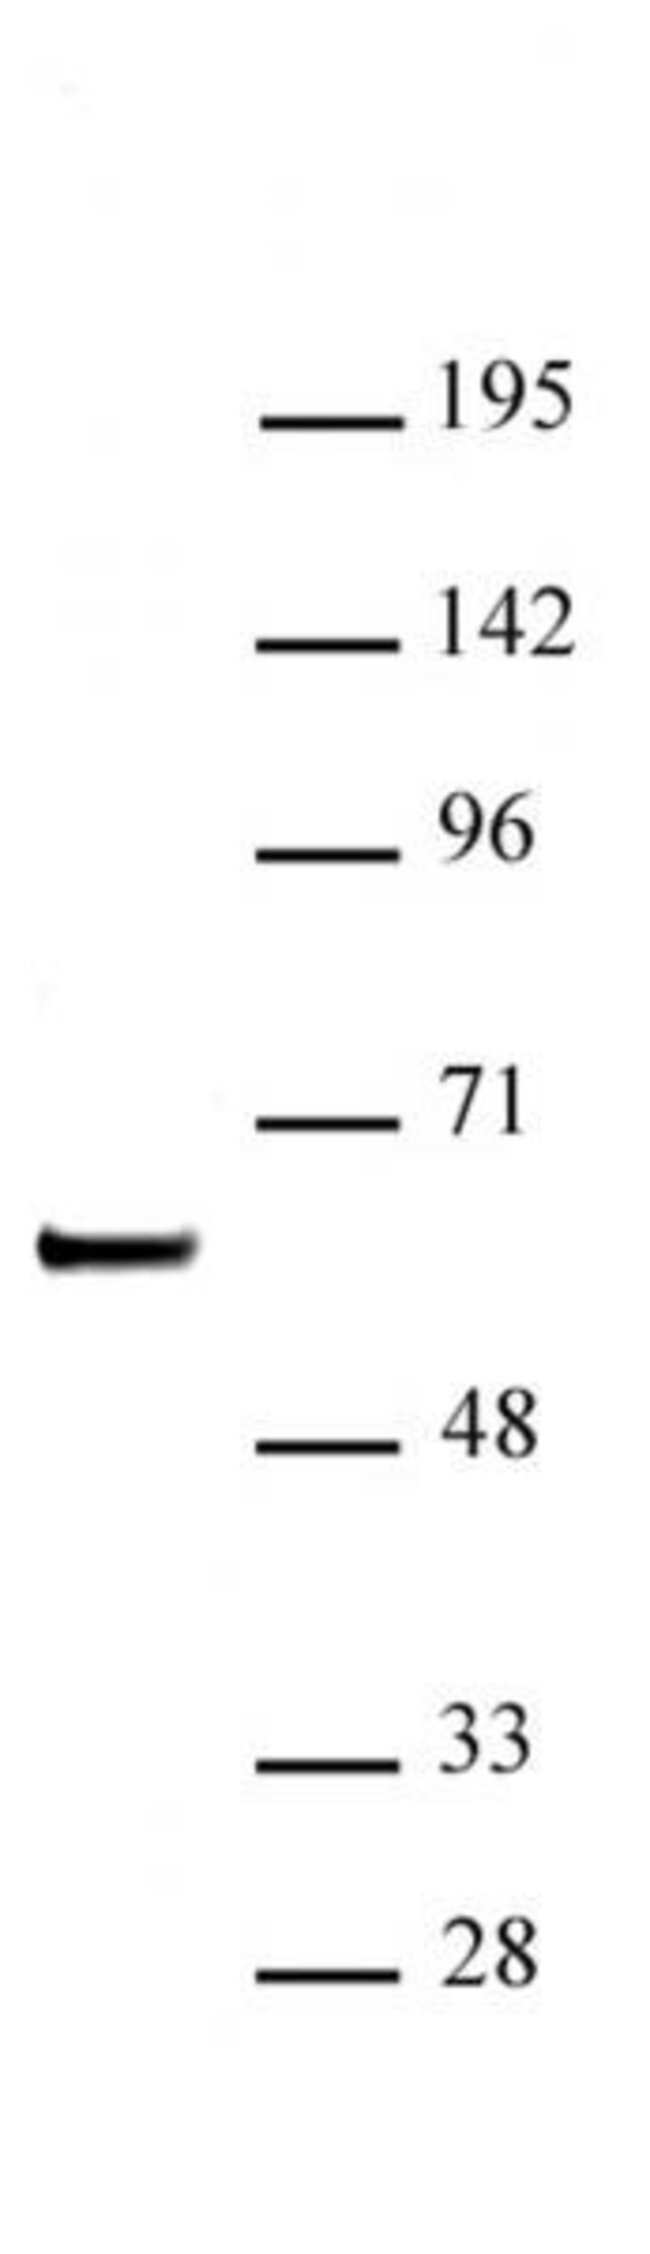 SETD7 / SET7 Rabbit anti-Human, Unconjugated, Polyclonal, Active Motif:Antibodies:Primary